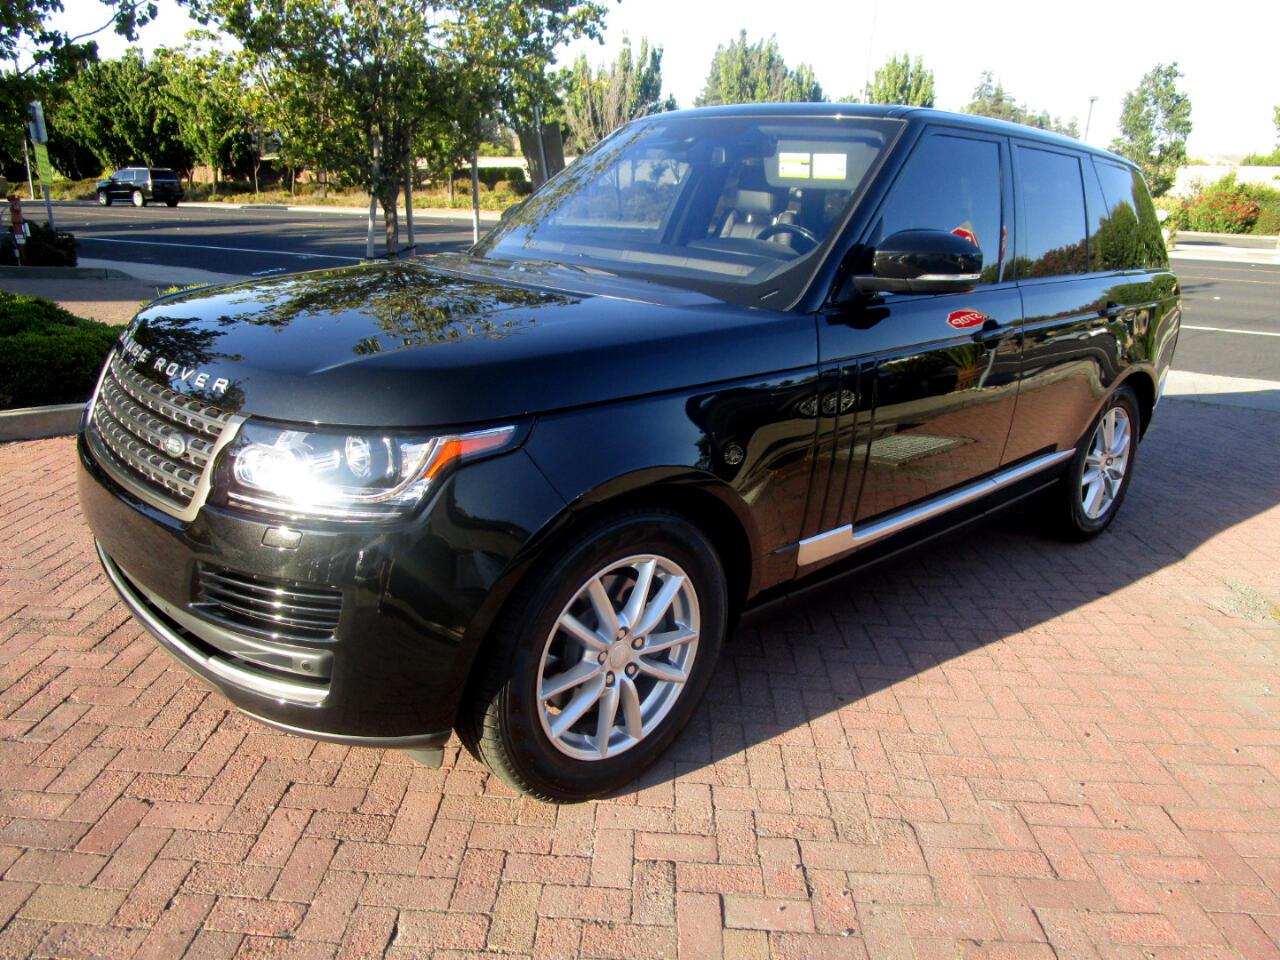 2016 Land Rover Range Rover TD6 DIESEL**HEAT SEATS**MERID SOUND*XENON LIGHTS**